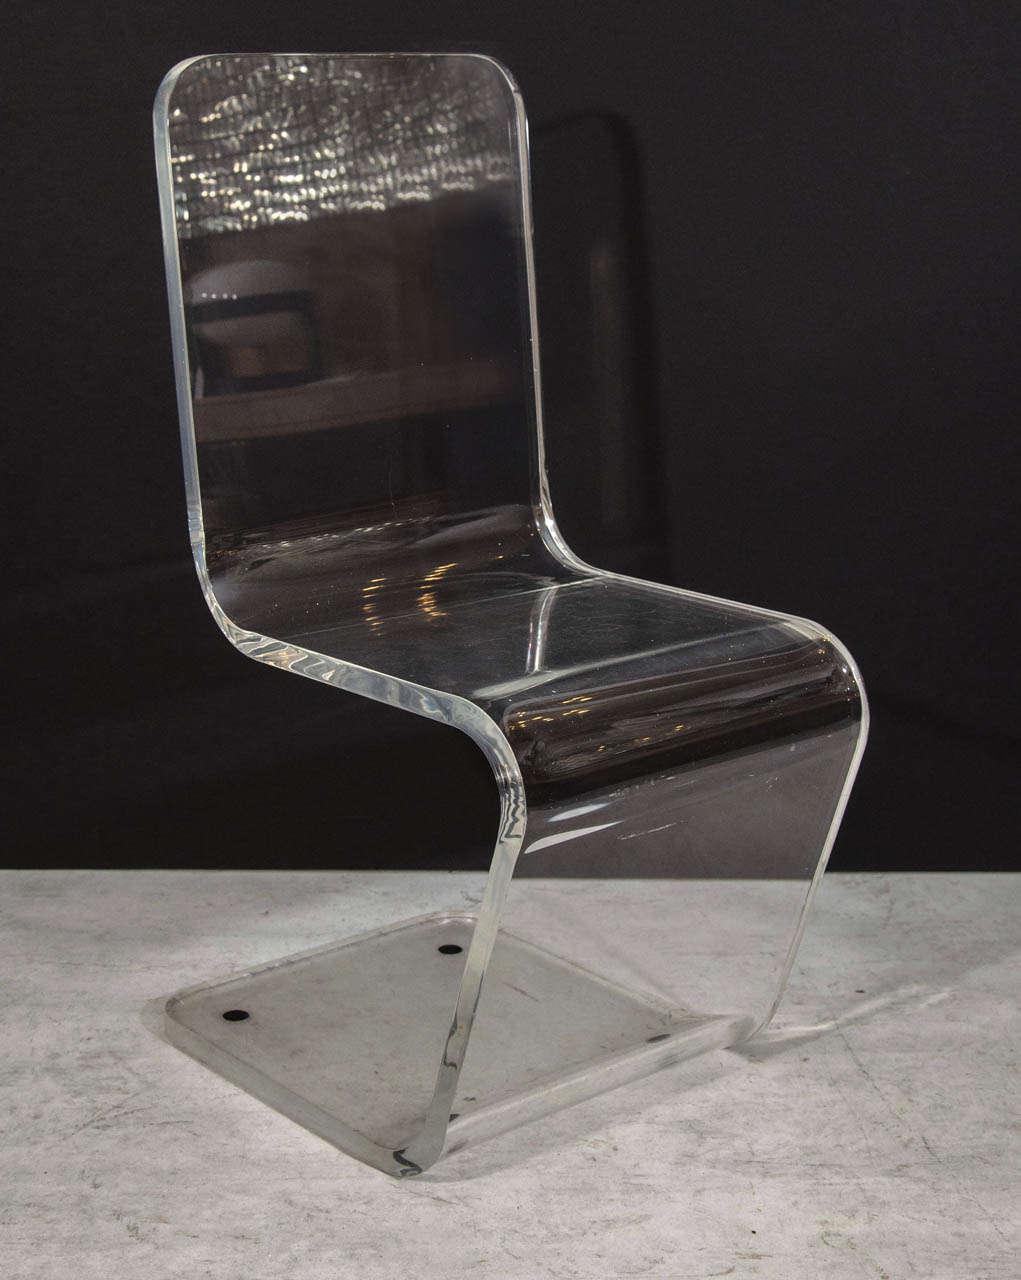 chaise zig zag chaise zig zag with chaise zig zag chaise zig zag art deco furniture for sale. Black Bedroom Furniture Sets. Home Design Ideas